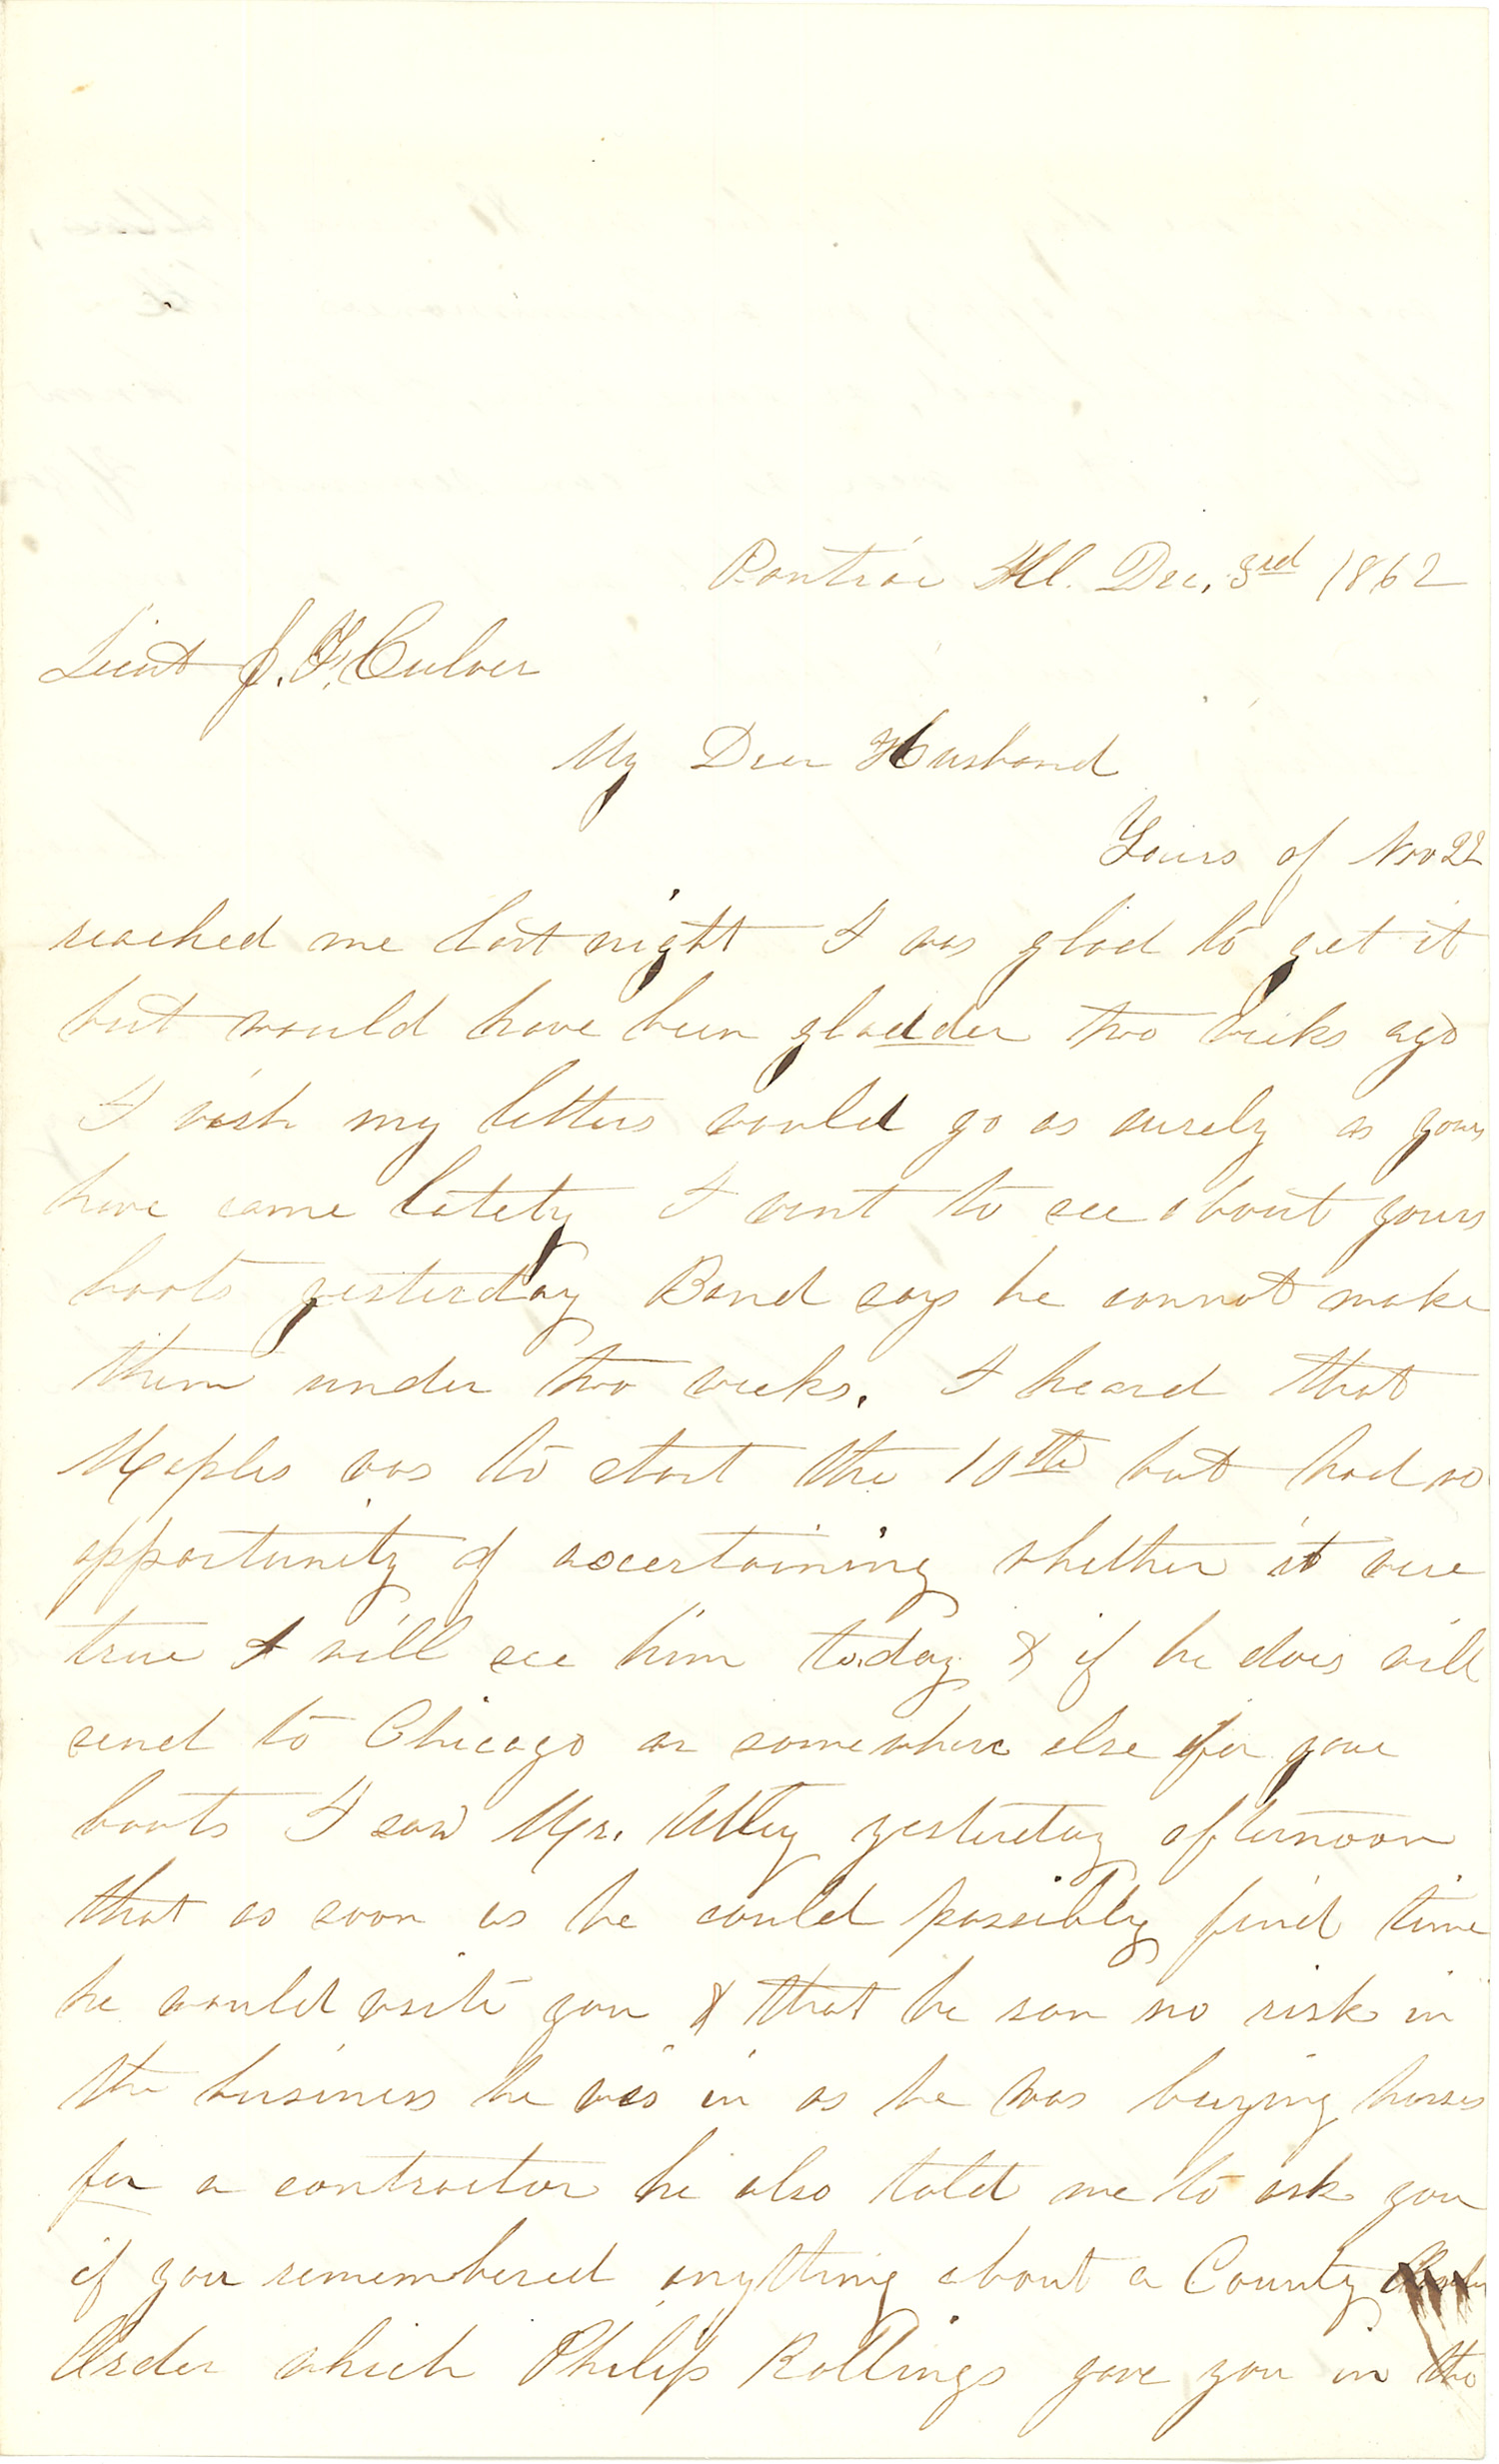 Joseph Culver Letter, December 3, 1862, Page 1